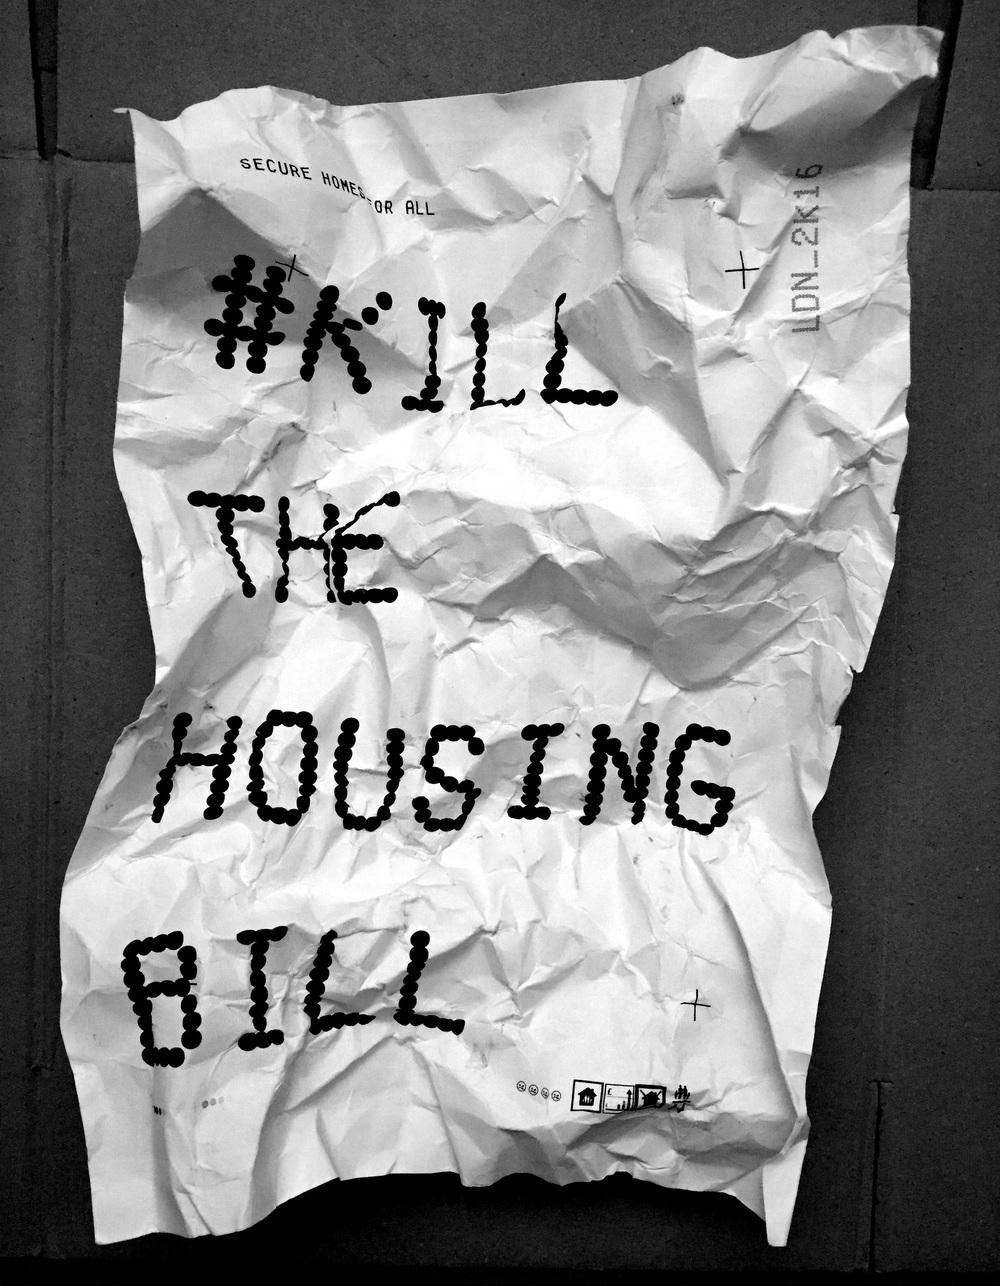 KILLTHEHOUSINGBILL_screwedup1©SNUFFCREATIVE2016.jpg